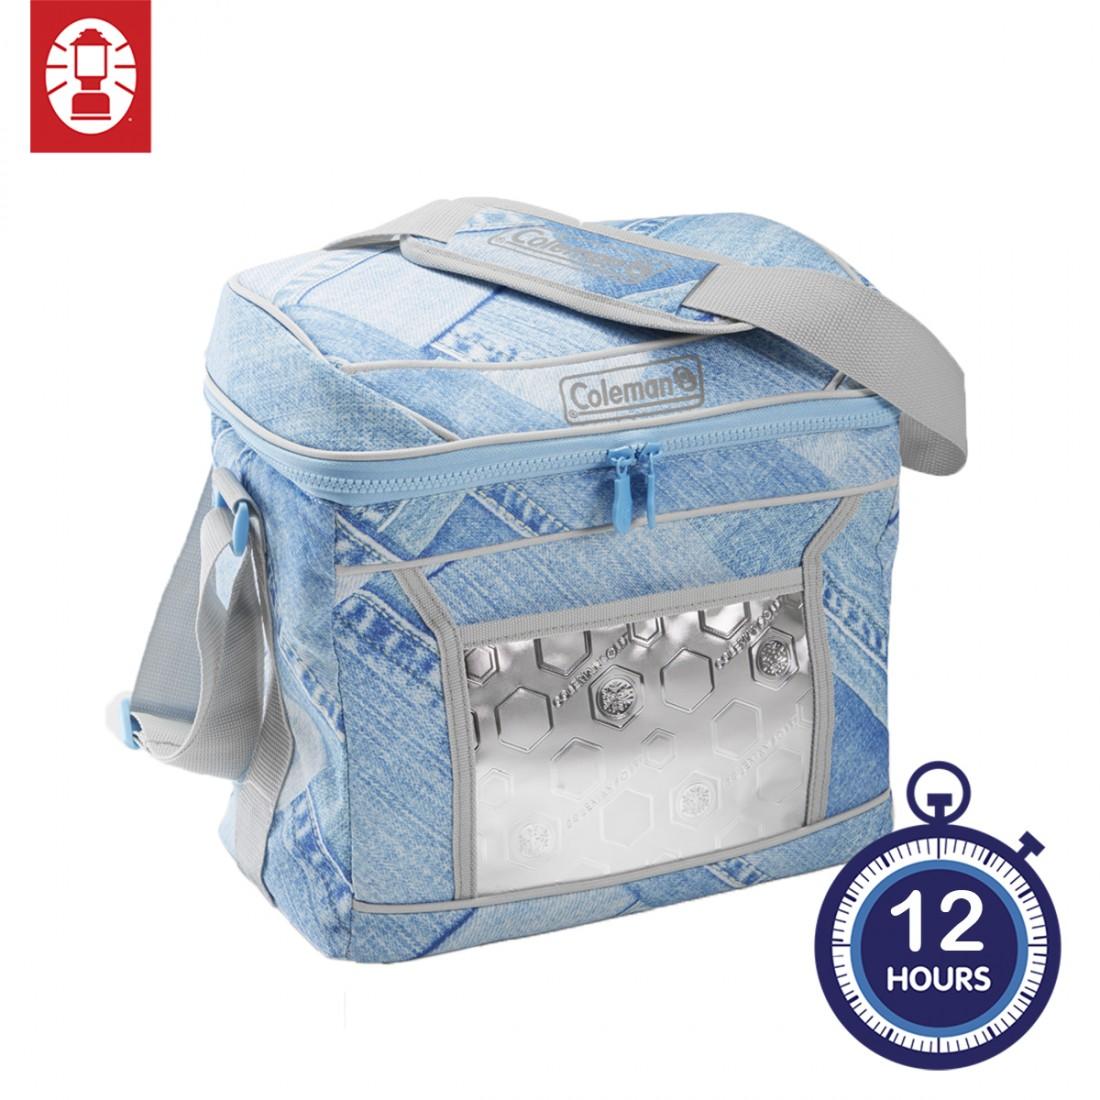 Coleman 12 Hours Denim Soft Cooler - 16 Cans